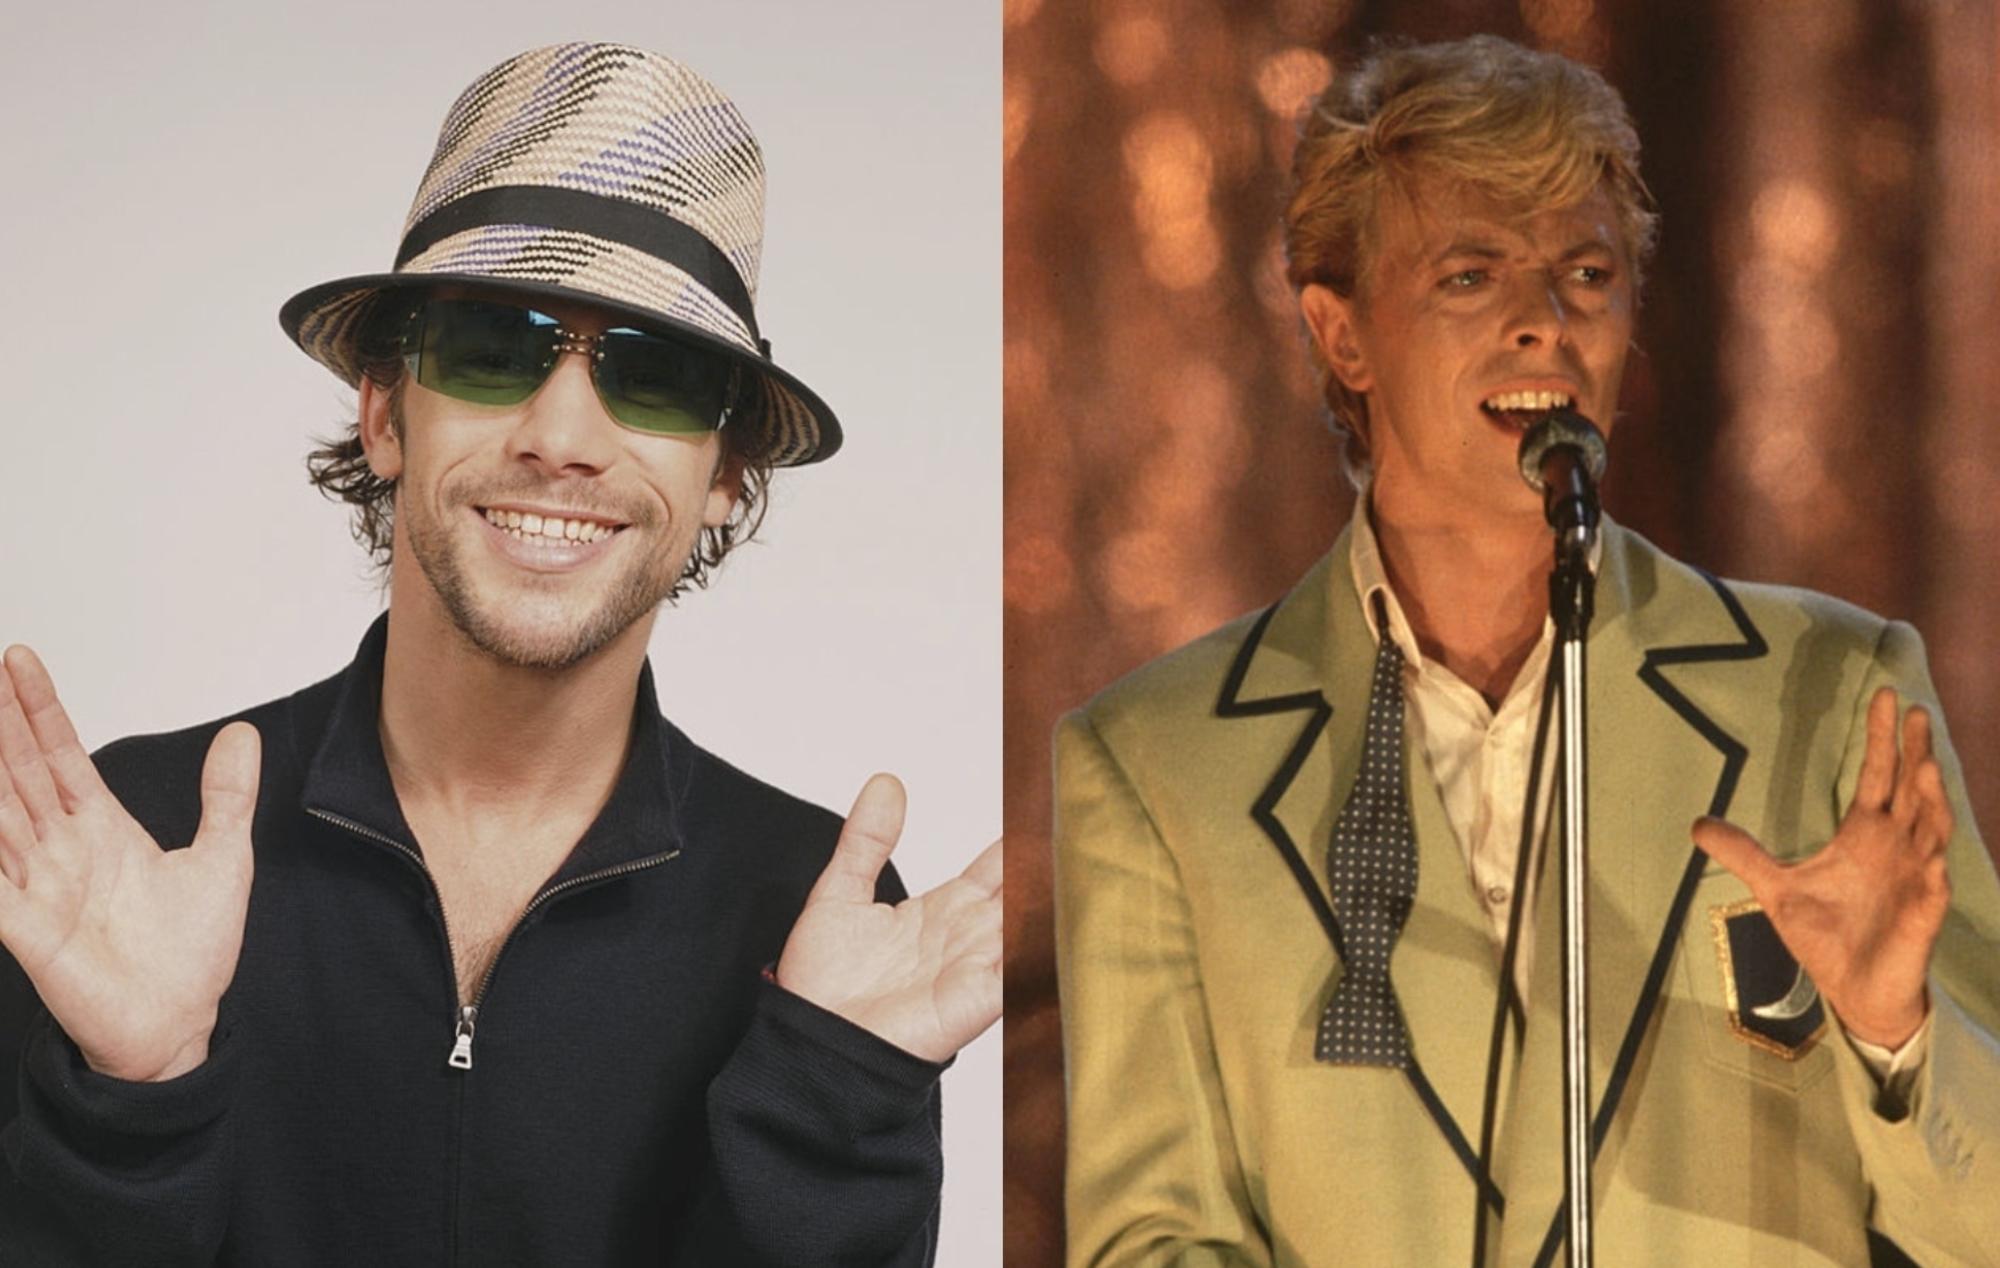 Jamiroquai reworks David Bowie's 'Let's Dance' into coronavirus anthem 'Lockdown'